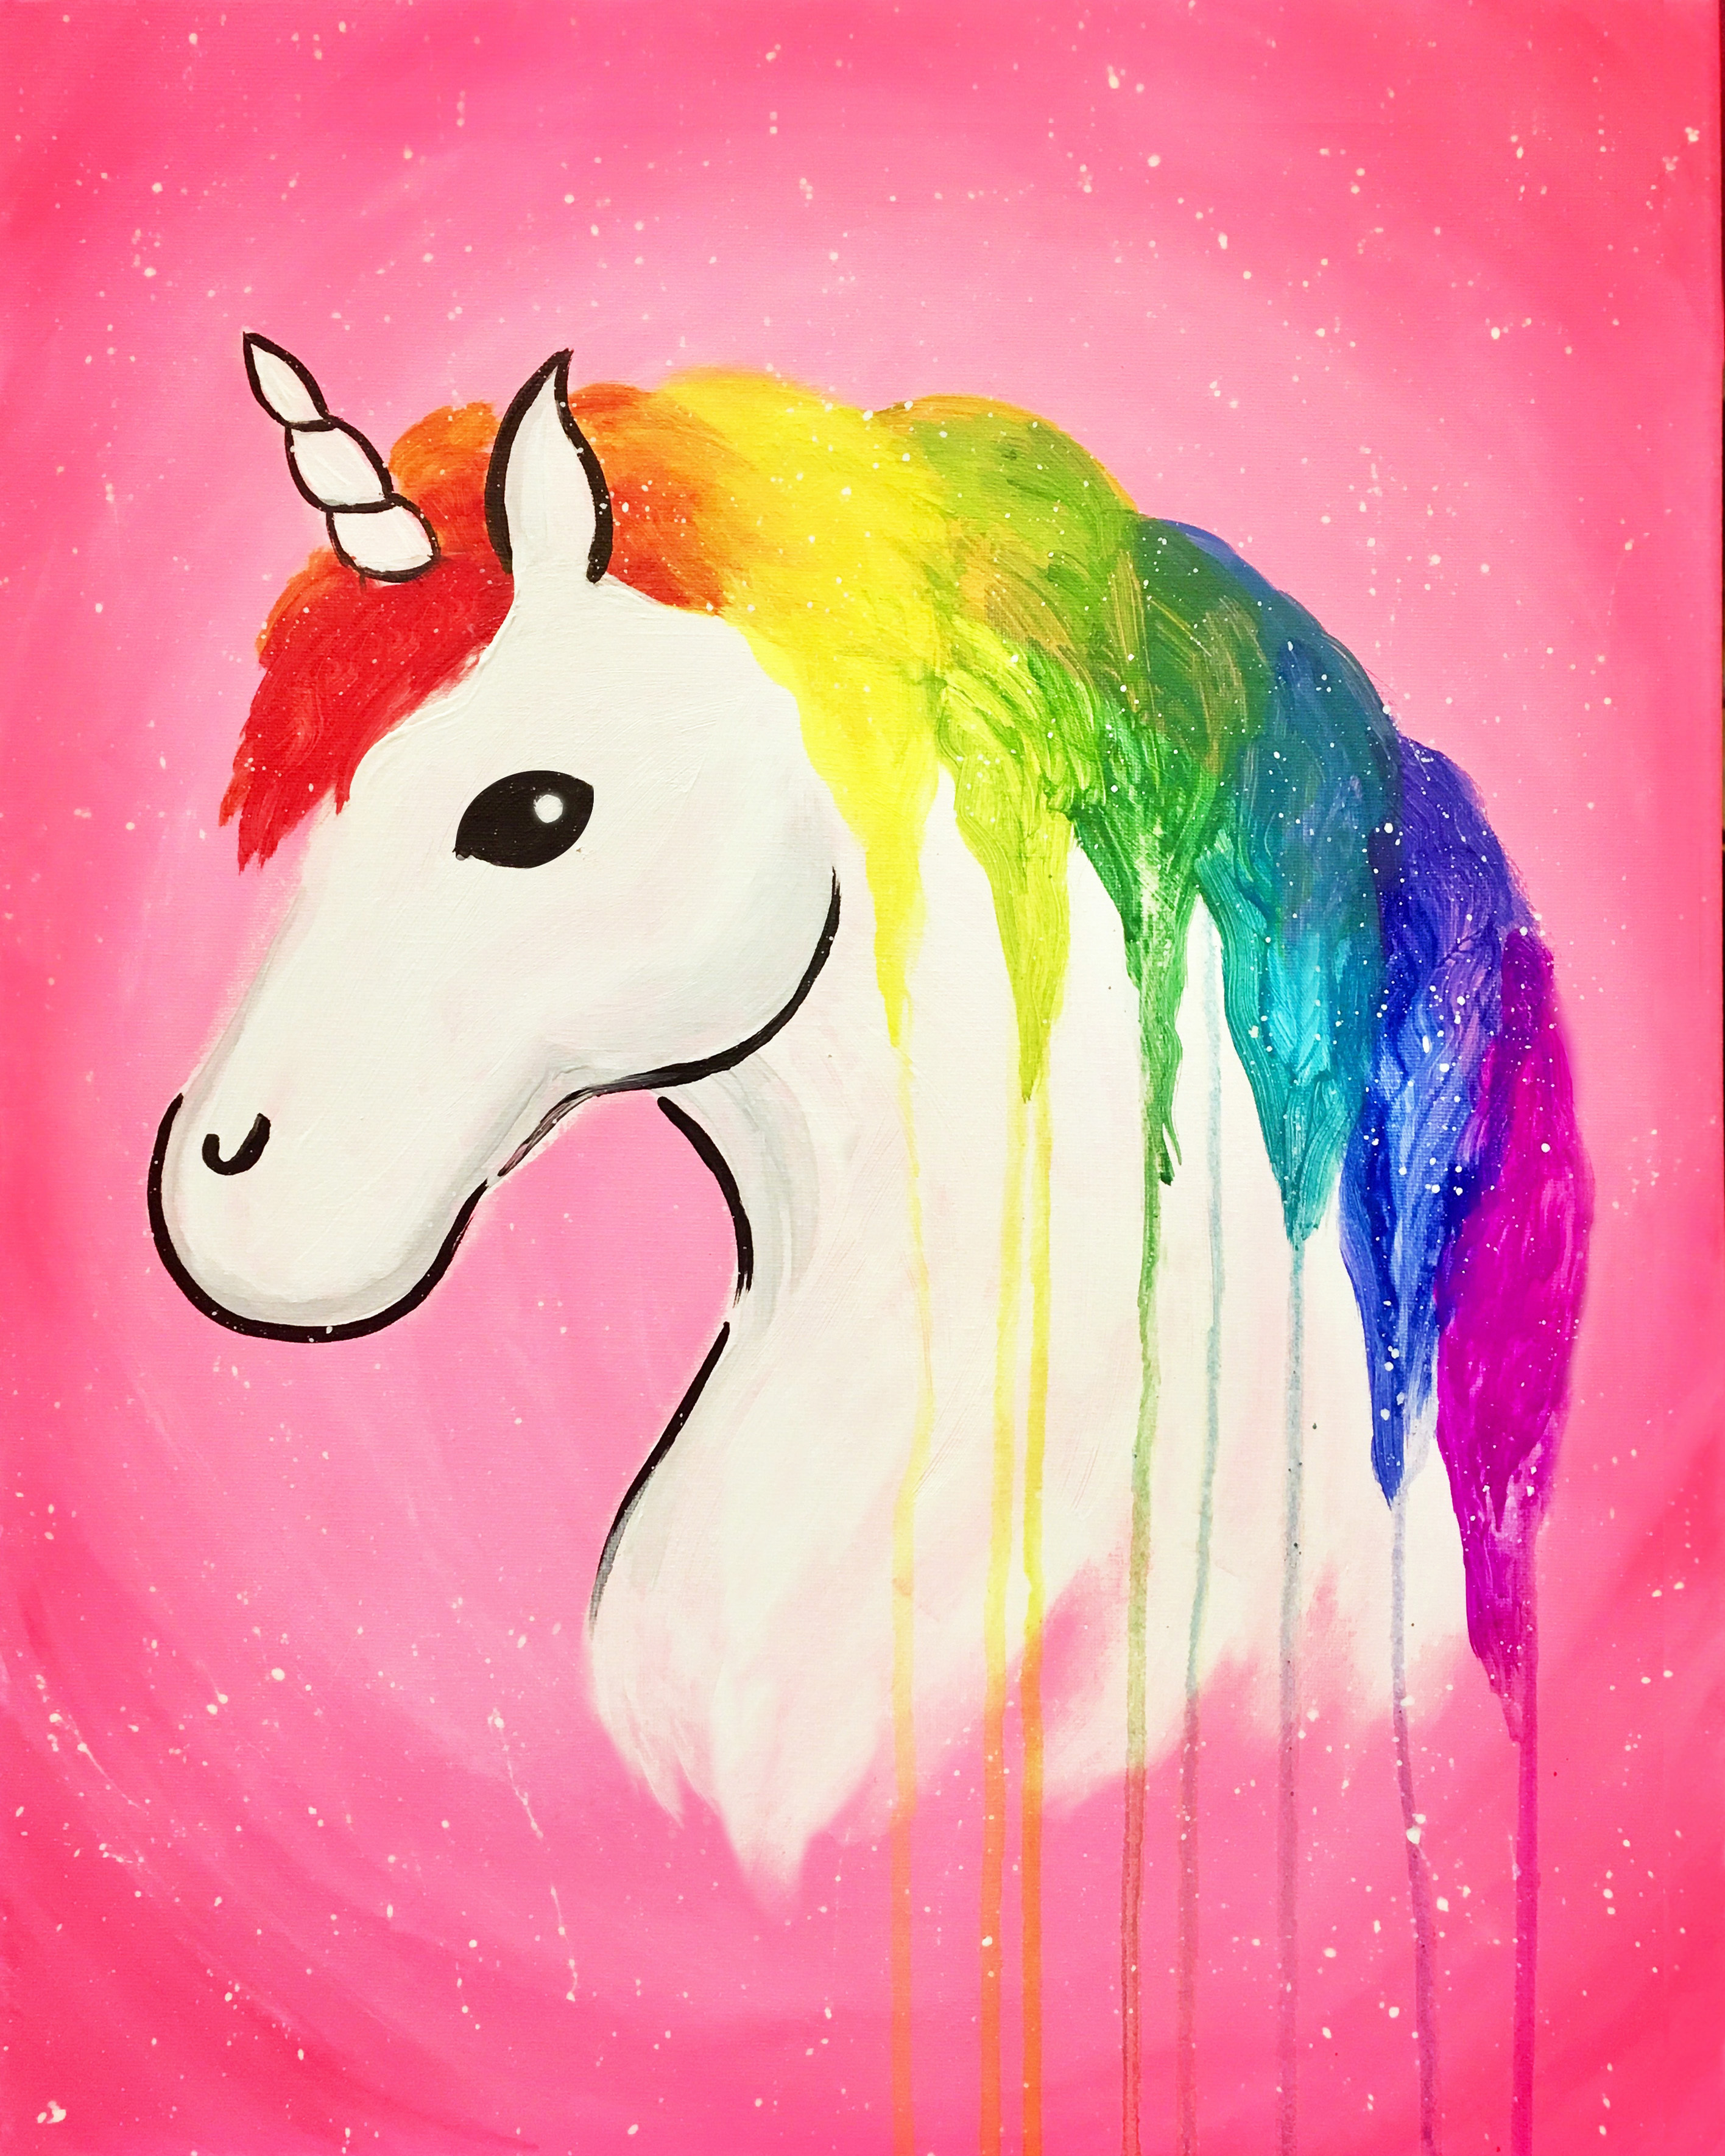 https://studio.pinotspalette.com/brandon/images/rainbow-unicorn.jpg